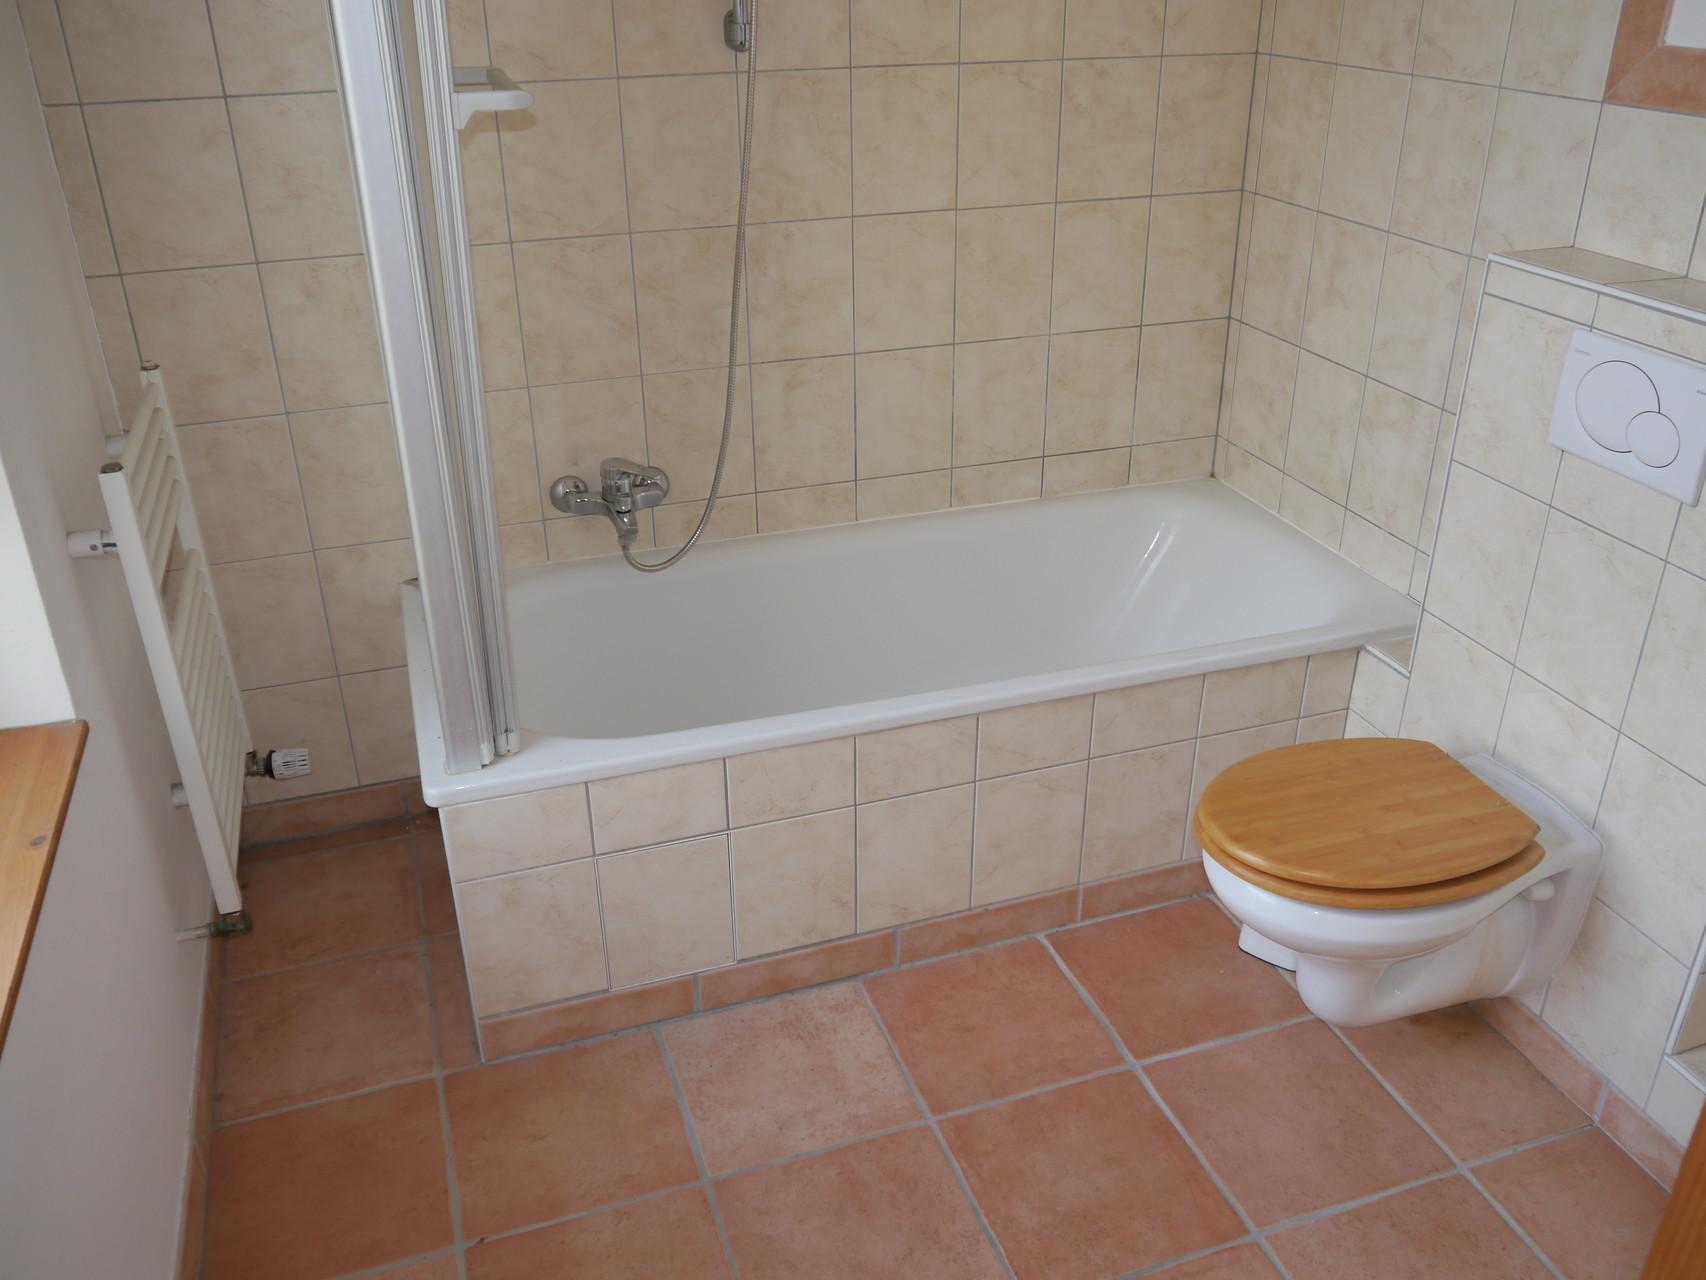 20-Zimmer Wohnung, Lübeck St.Gertrud - CG Immobilien Lübeck